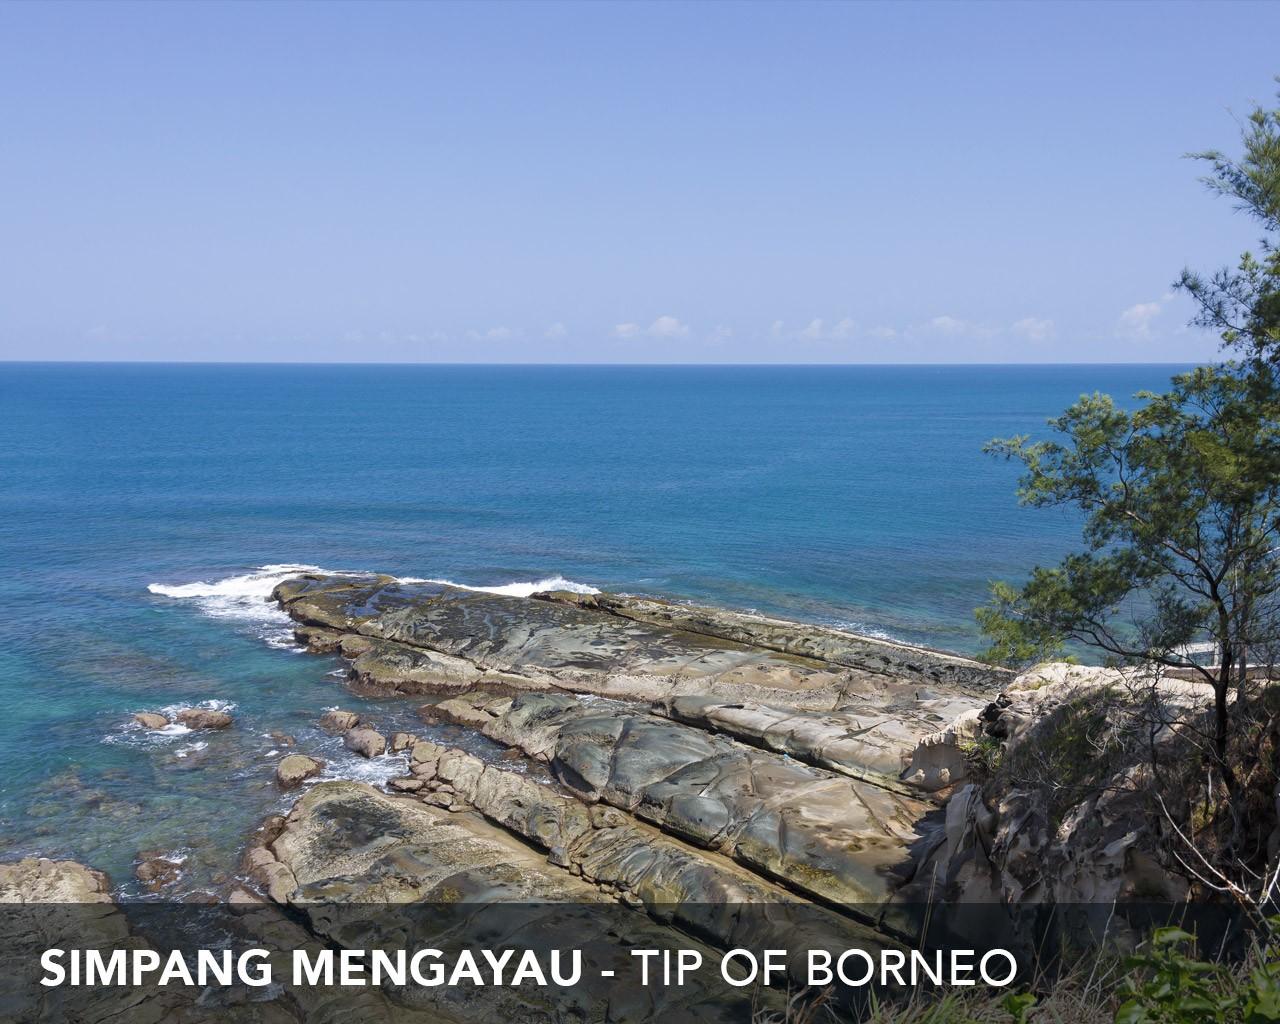 Simpang Mengayau - Tip of Borneo